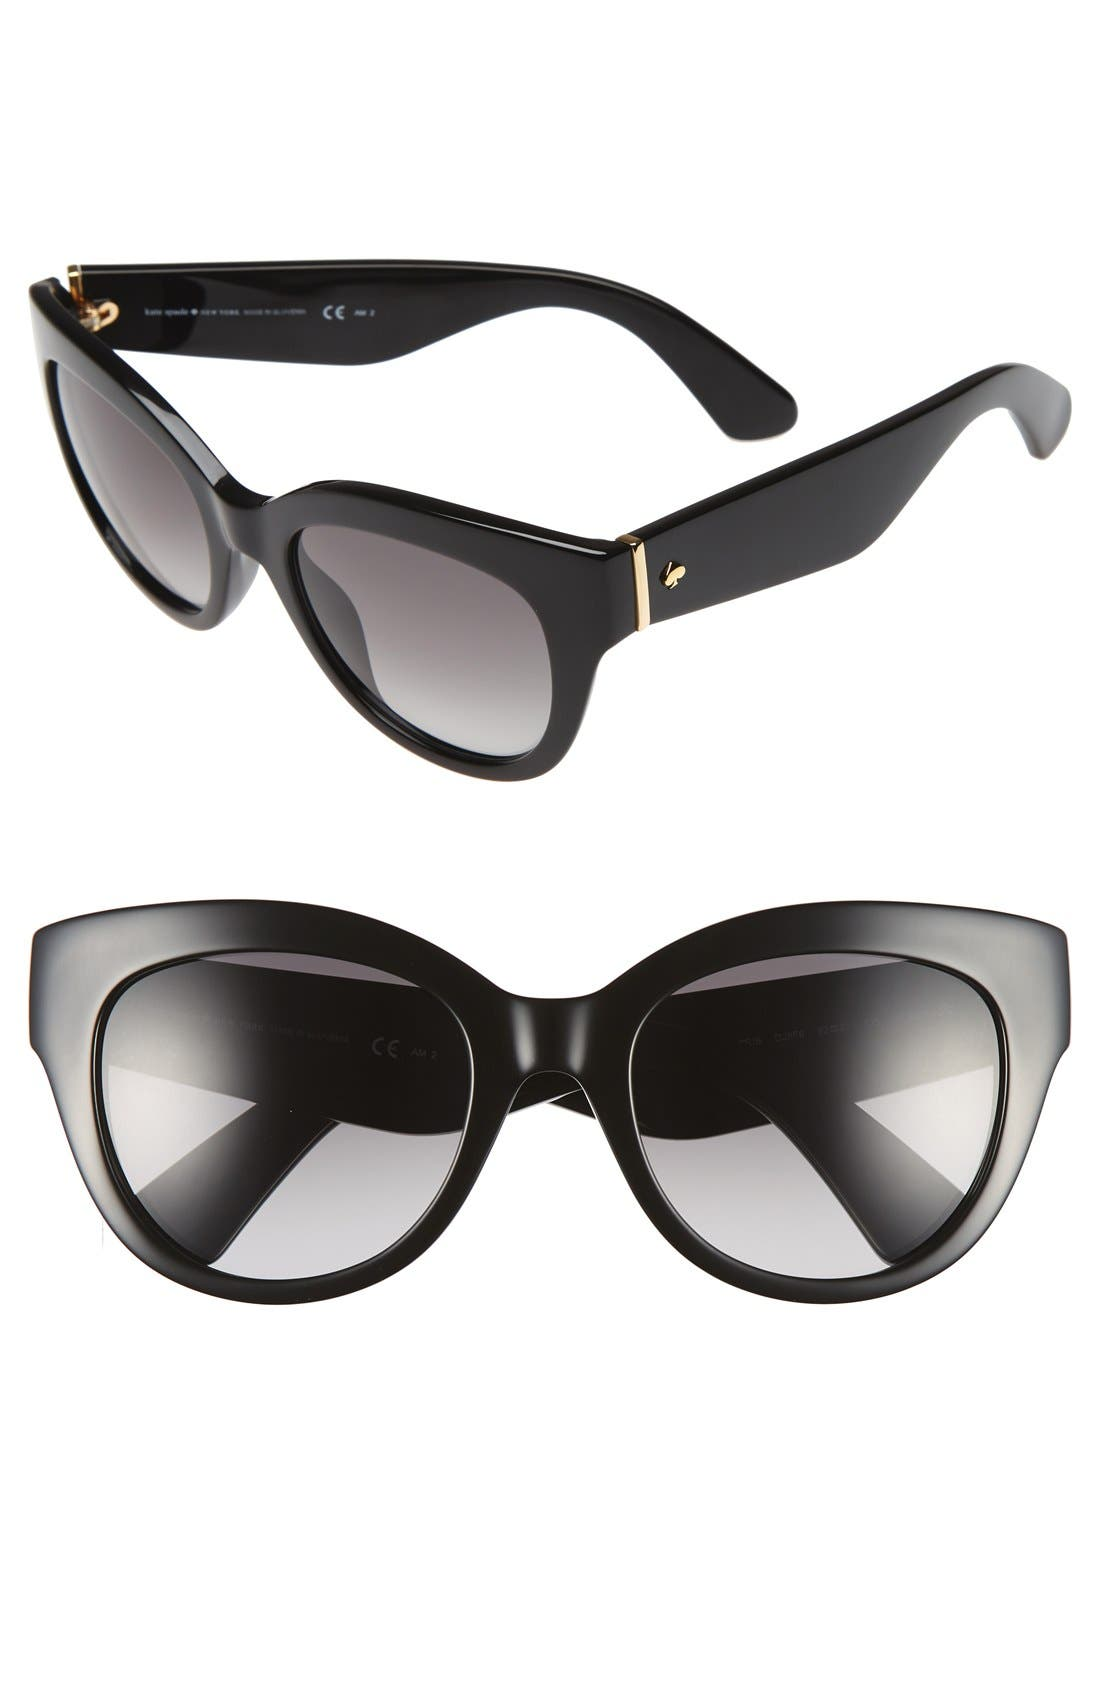 KATE SPADE NEW YORK sharlots 52mm sunglasses